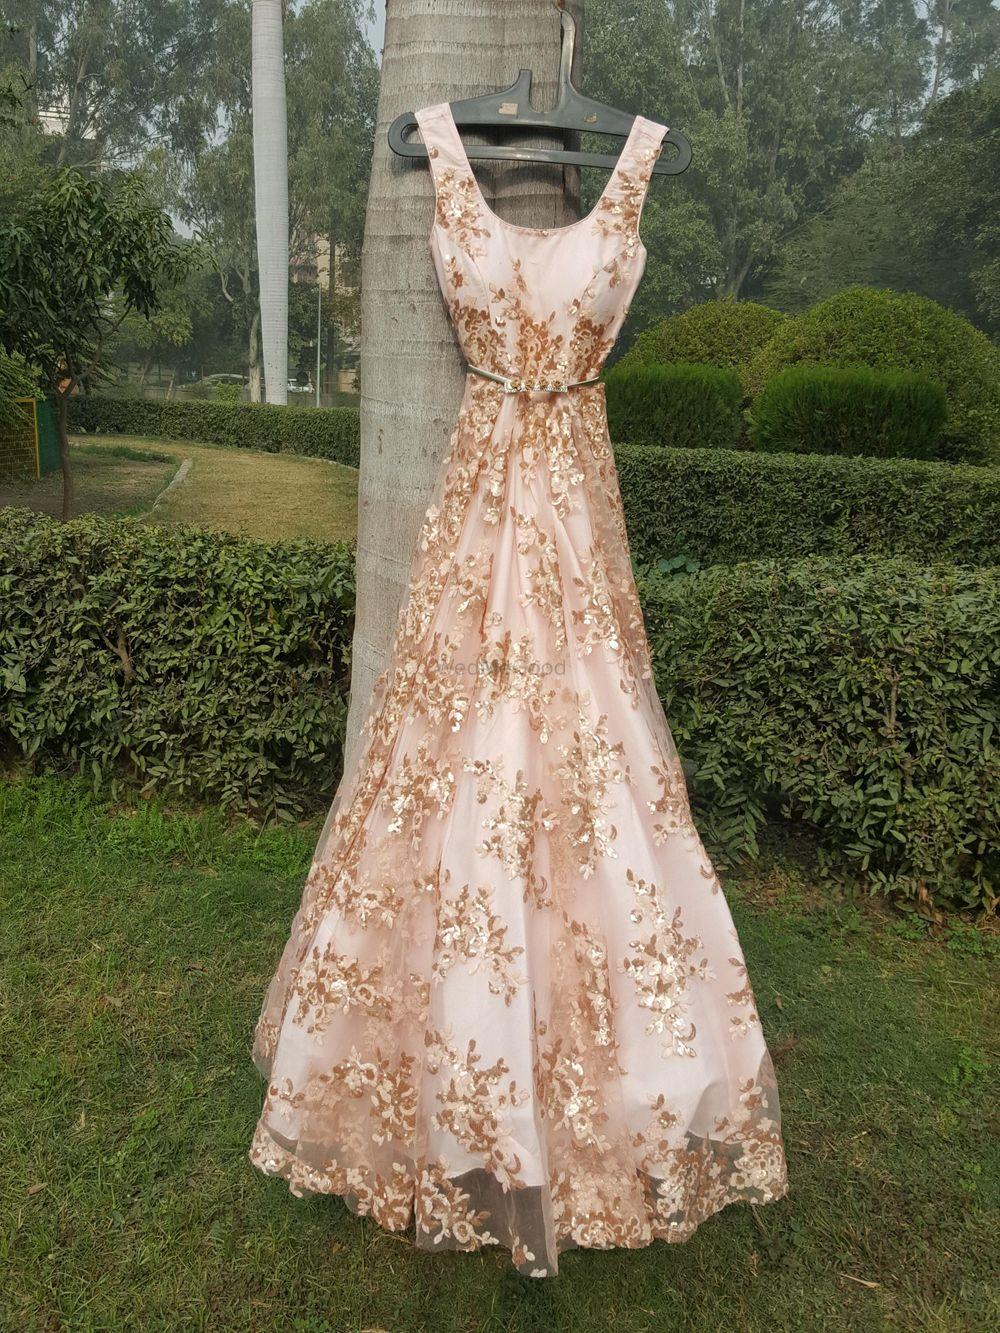 Photo From Dreamy Cocktail Gowns - By Chanderi Tiramisu